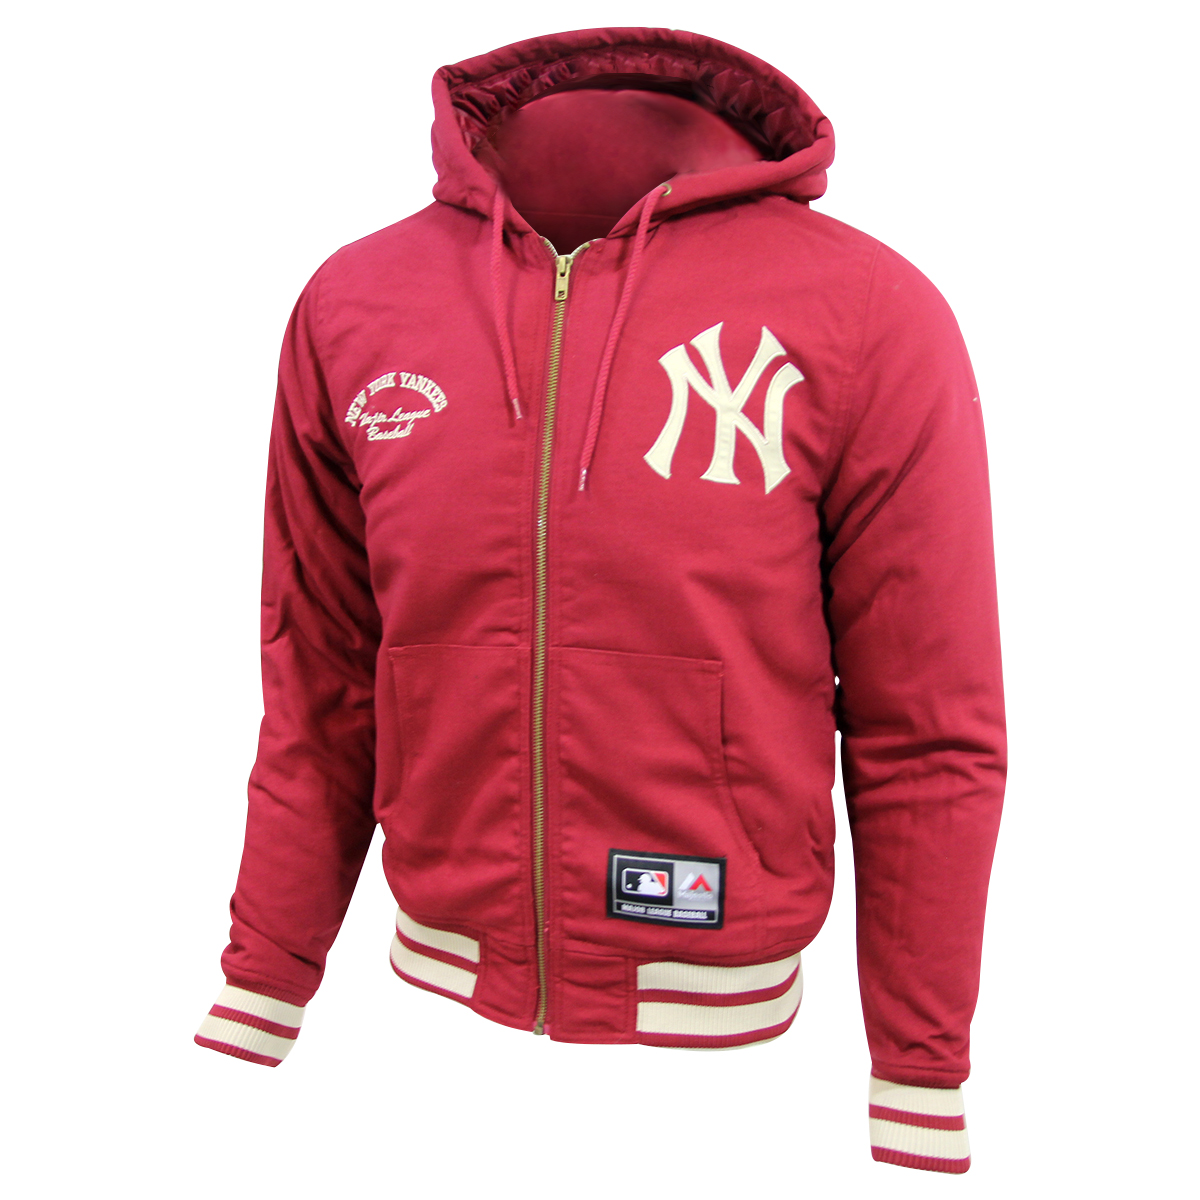 watch 181f9 8f84e Details about Majestic DEERING NEW YORK YANKEE HOODIE Men Major League  Baseball Jacket